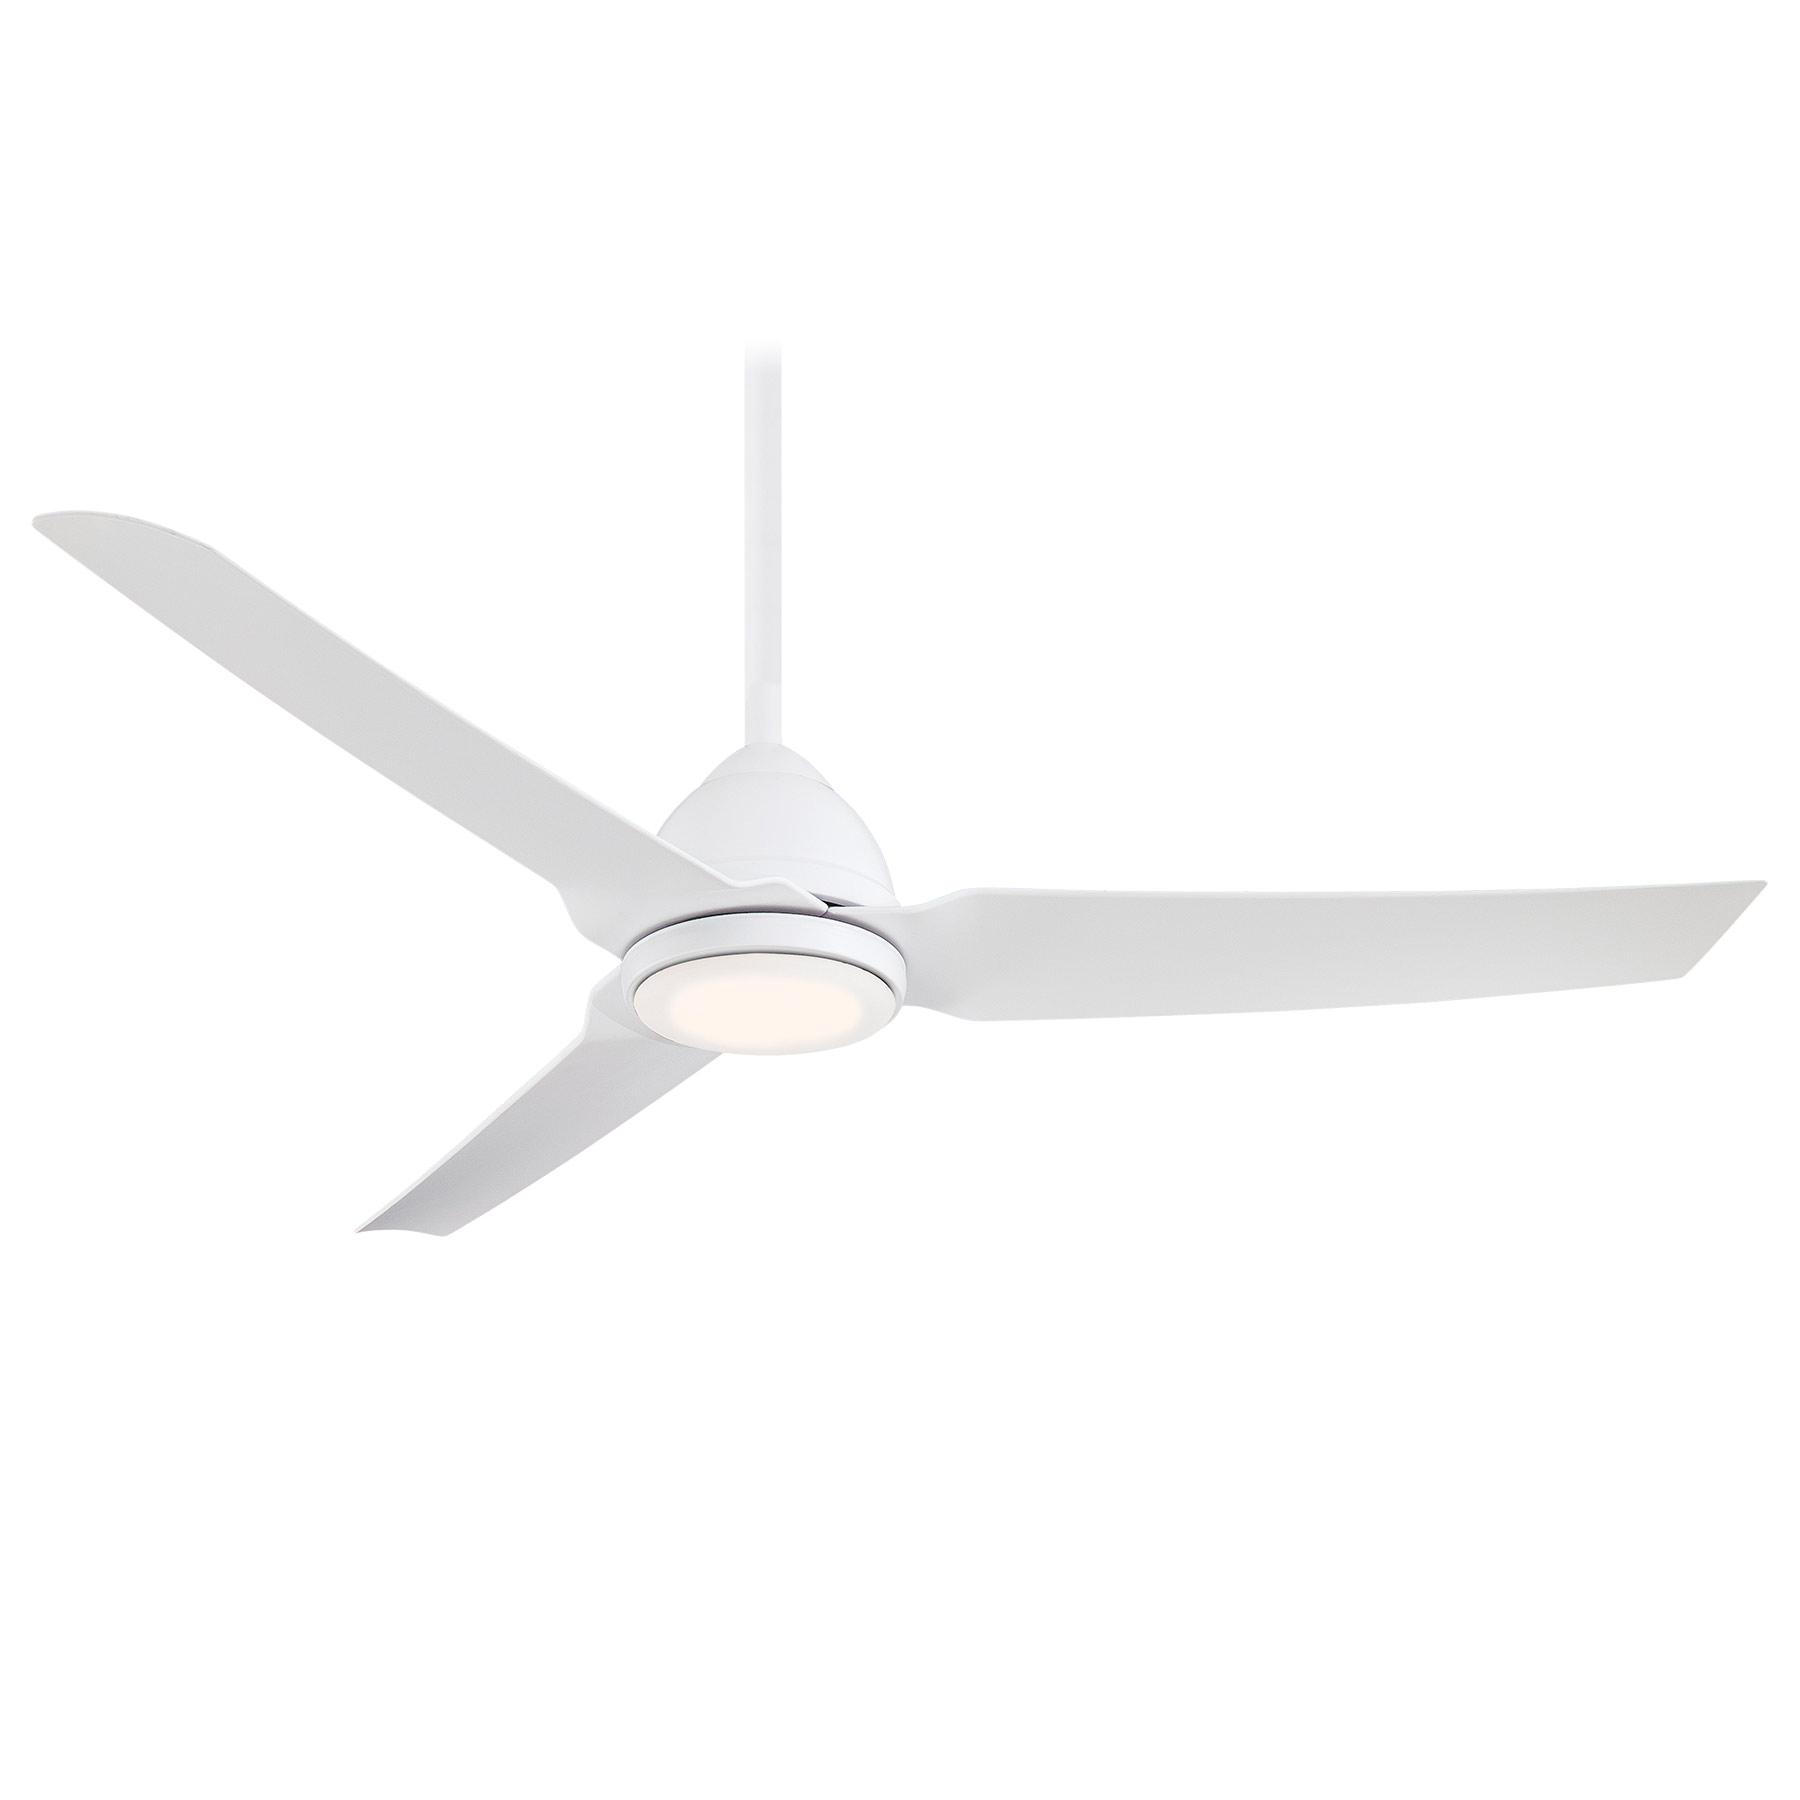 java ceiling fan with light by minka aire f753lwhf - Minka Ceiling Fans